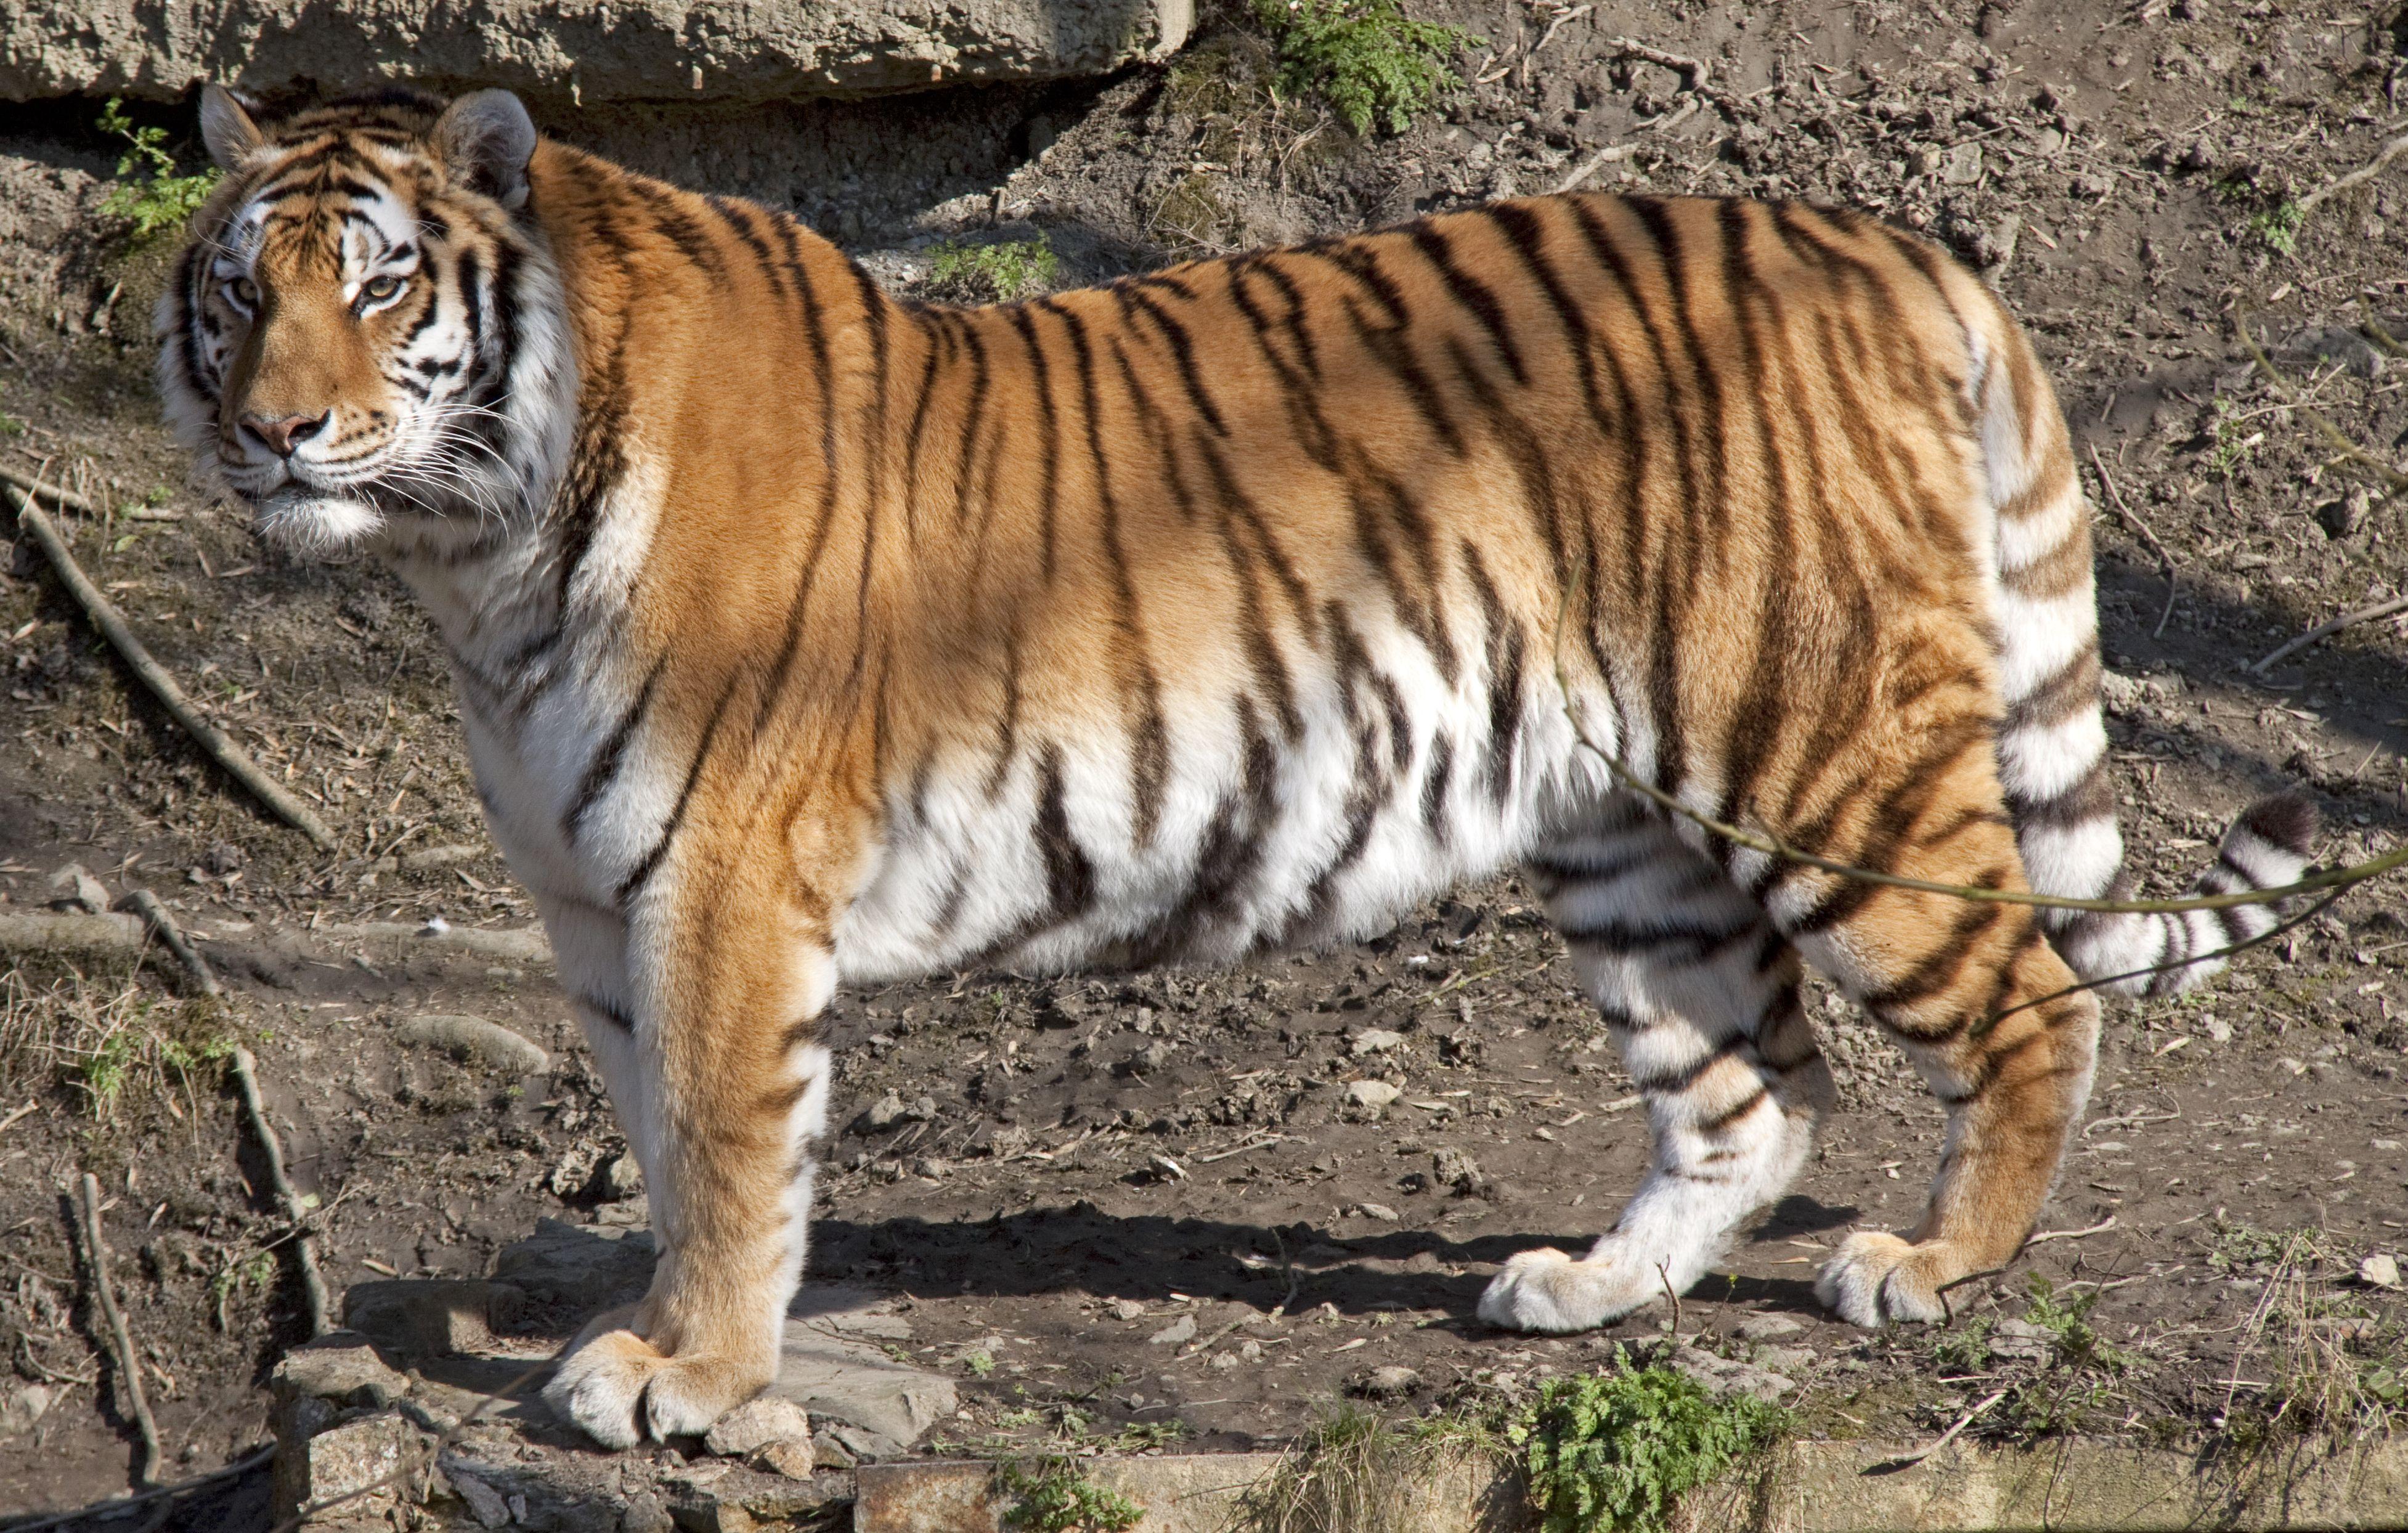 Side View of an Amur Tiger standing still Amur tiger